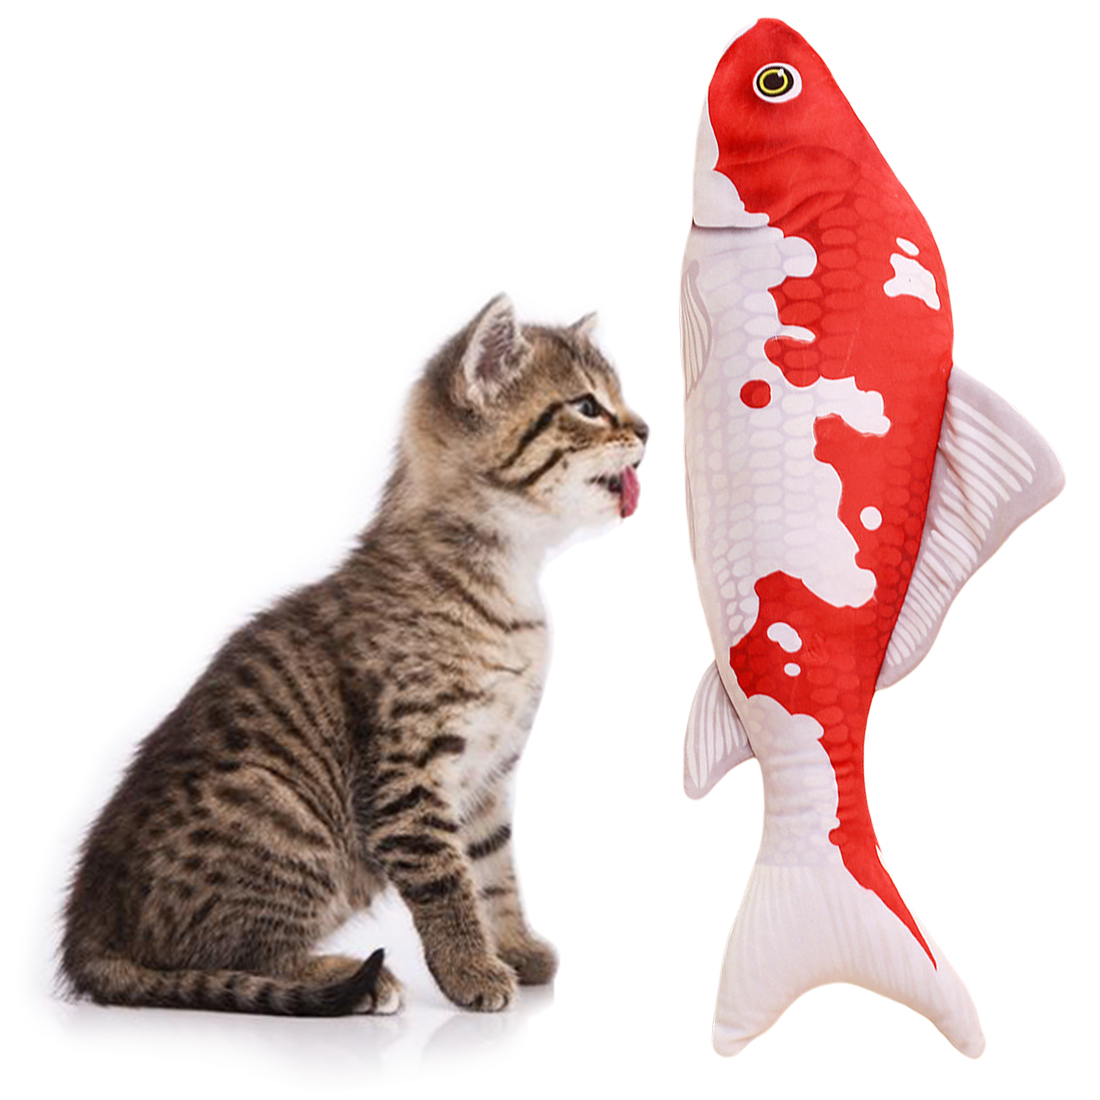 Hot! 1PC Creative Pet Cat Kitten Chewing Cat Toys Catnip Stuffed Fish Interactive Kitten Product Cat Supplies